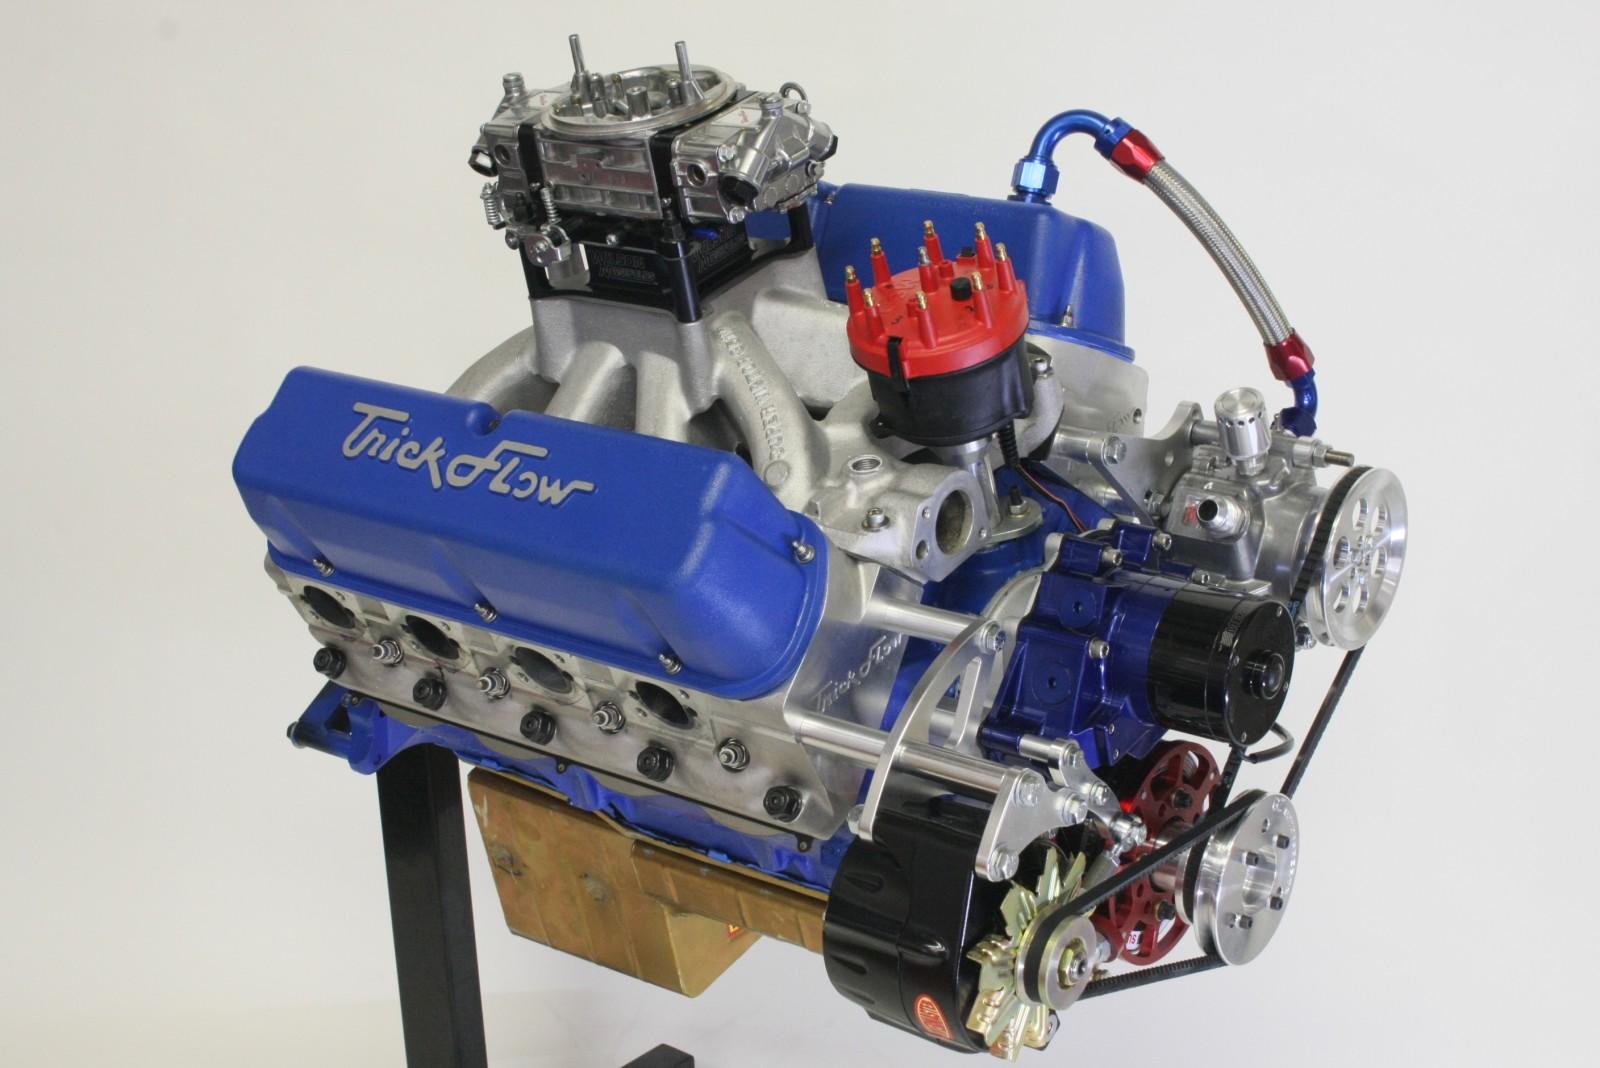 The Wonder Windsor: Hardcore Horsepower's 735 HP Small Block